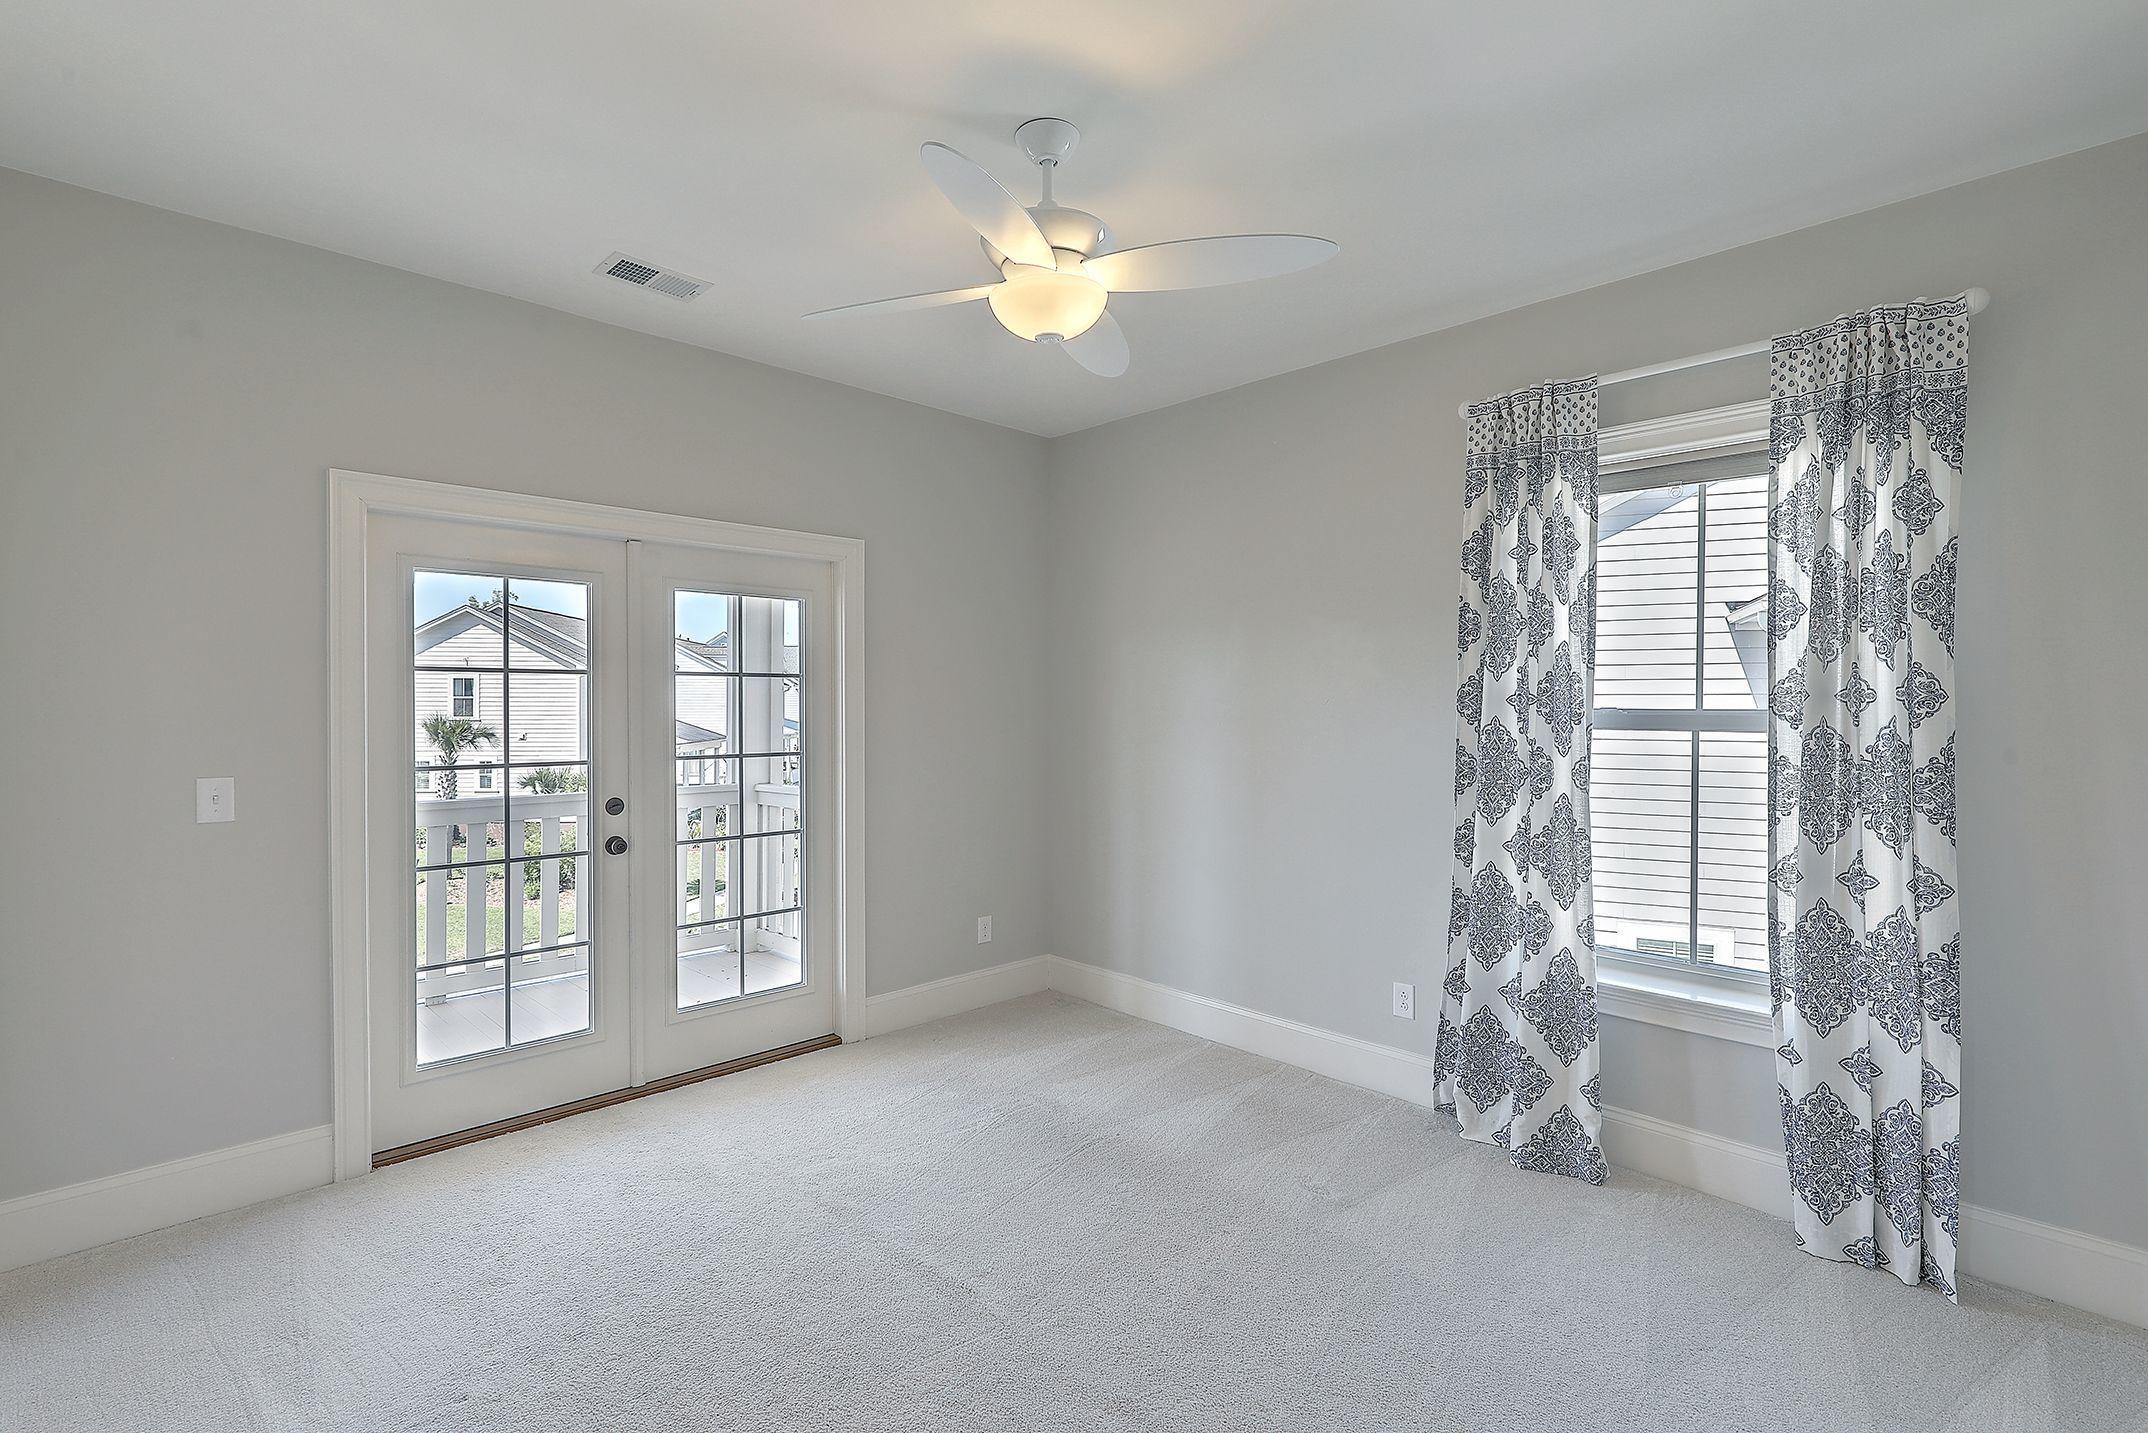 Carolina Park Homes For Sale - 1529 Bourne, Mount Pleasant, SC - 26